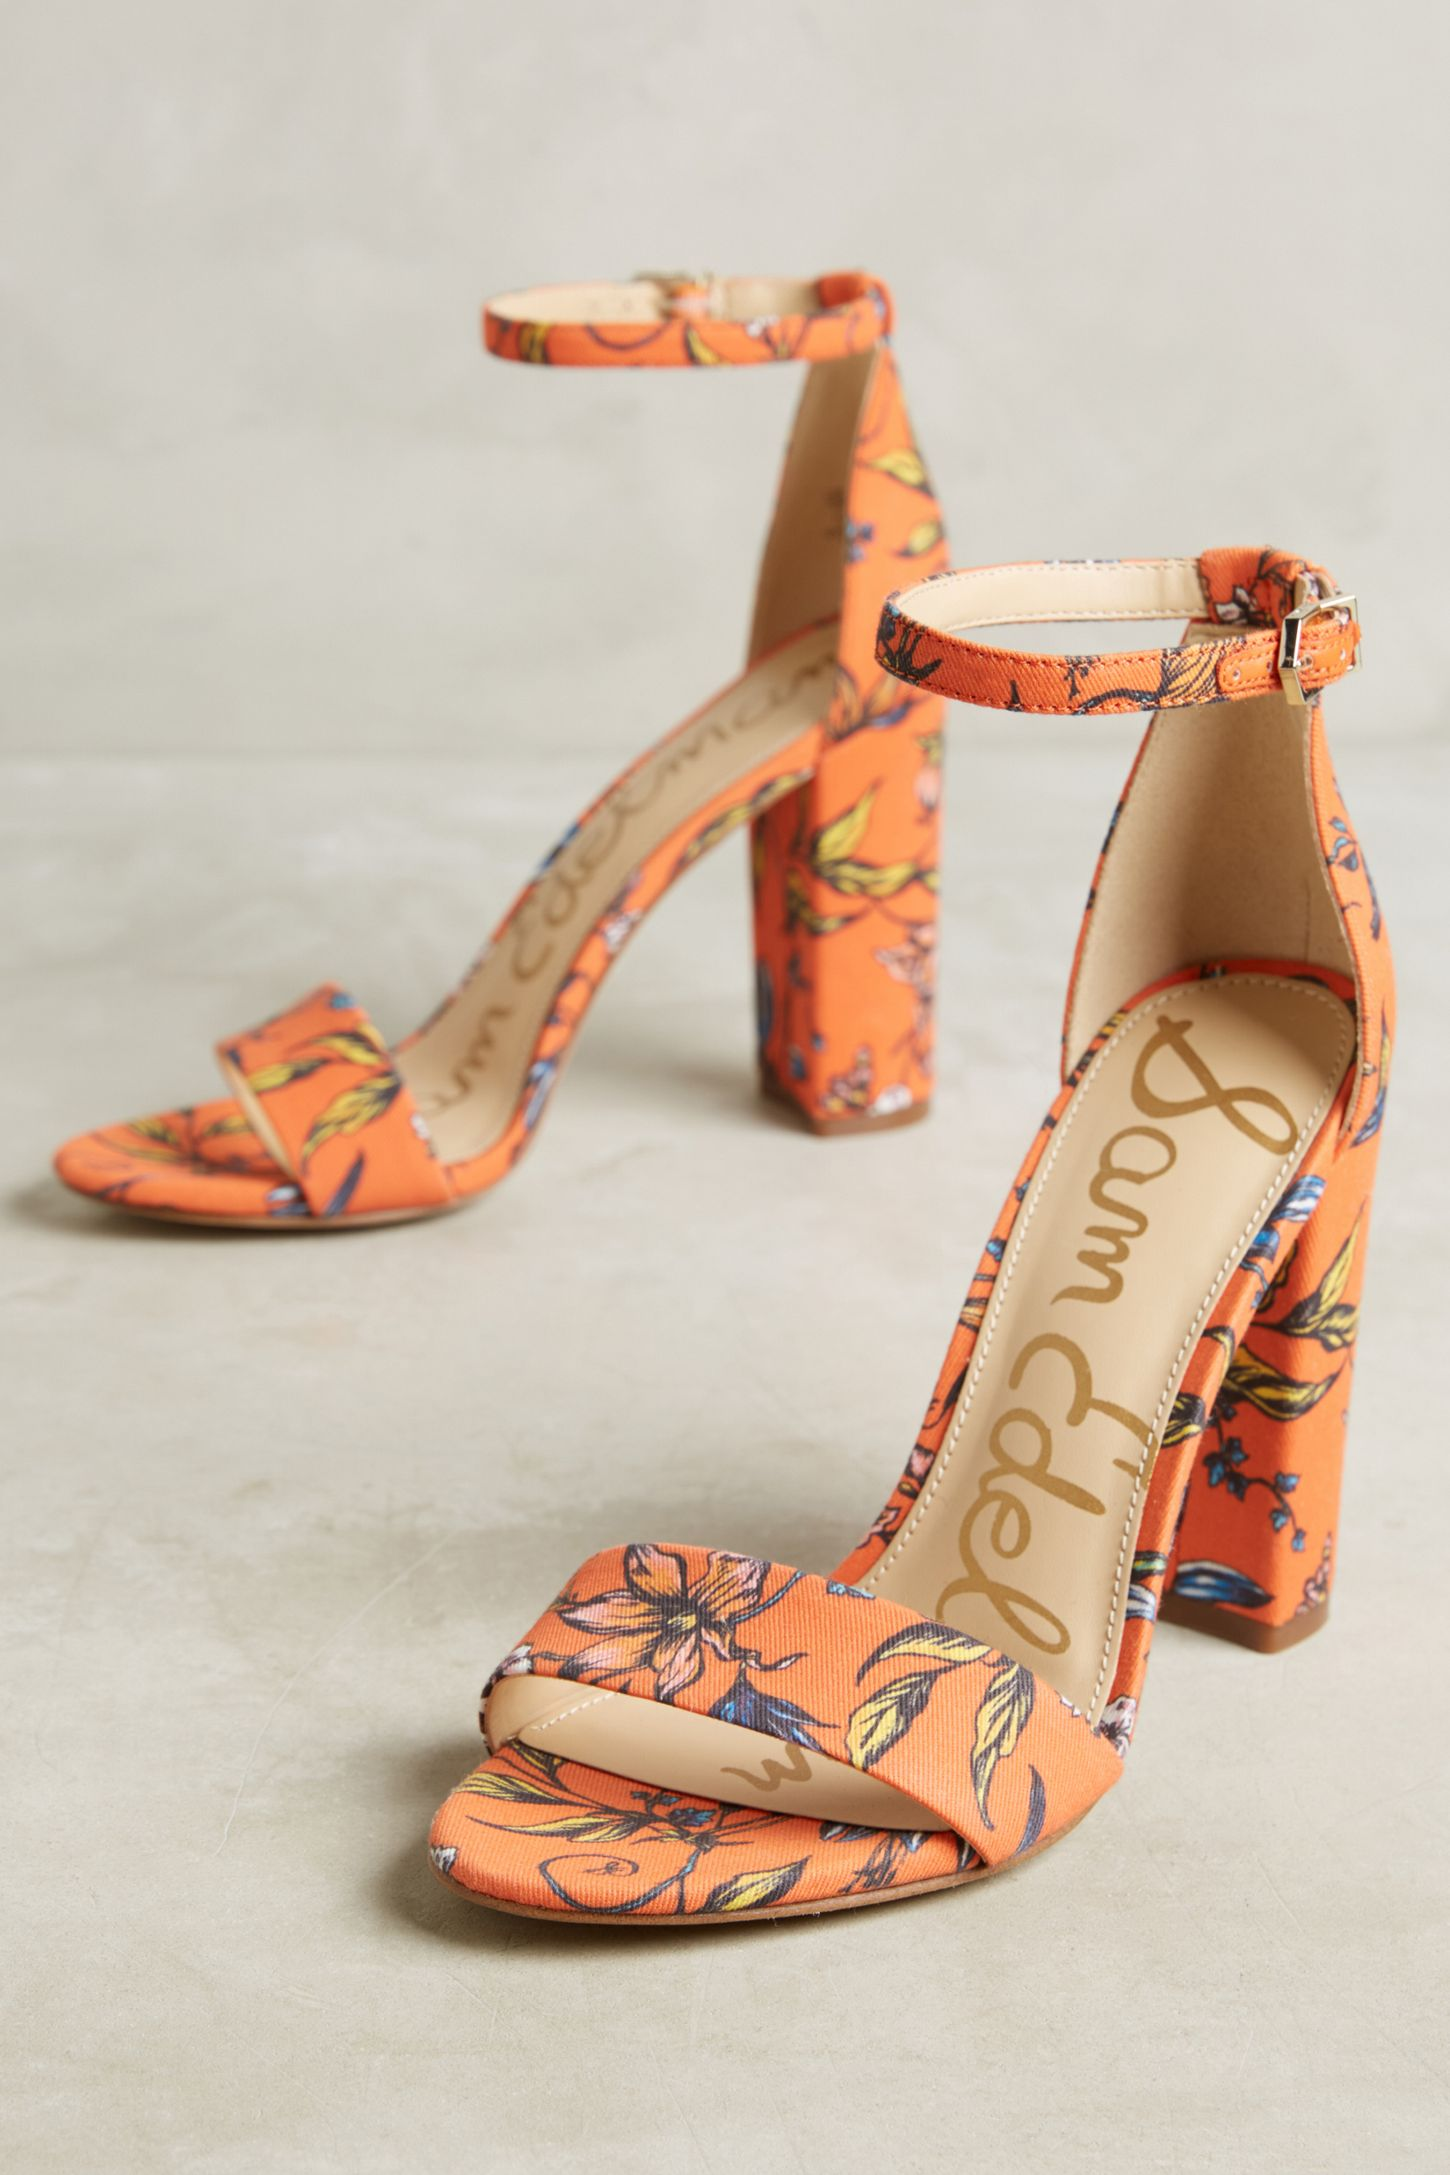 c2b5c10018ca Sam Edelman Yaro Heeled Sandals